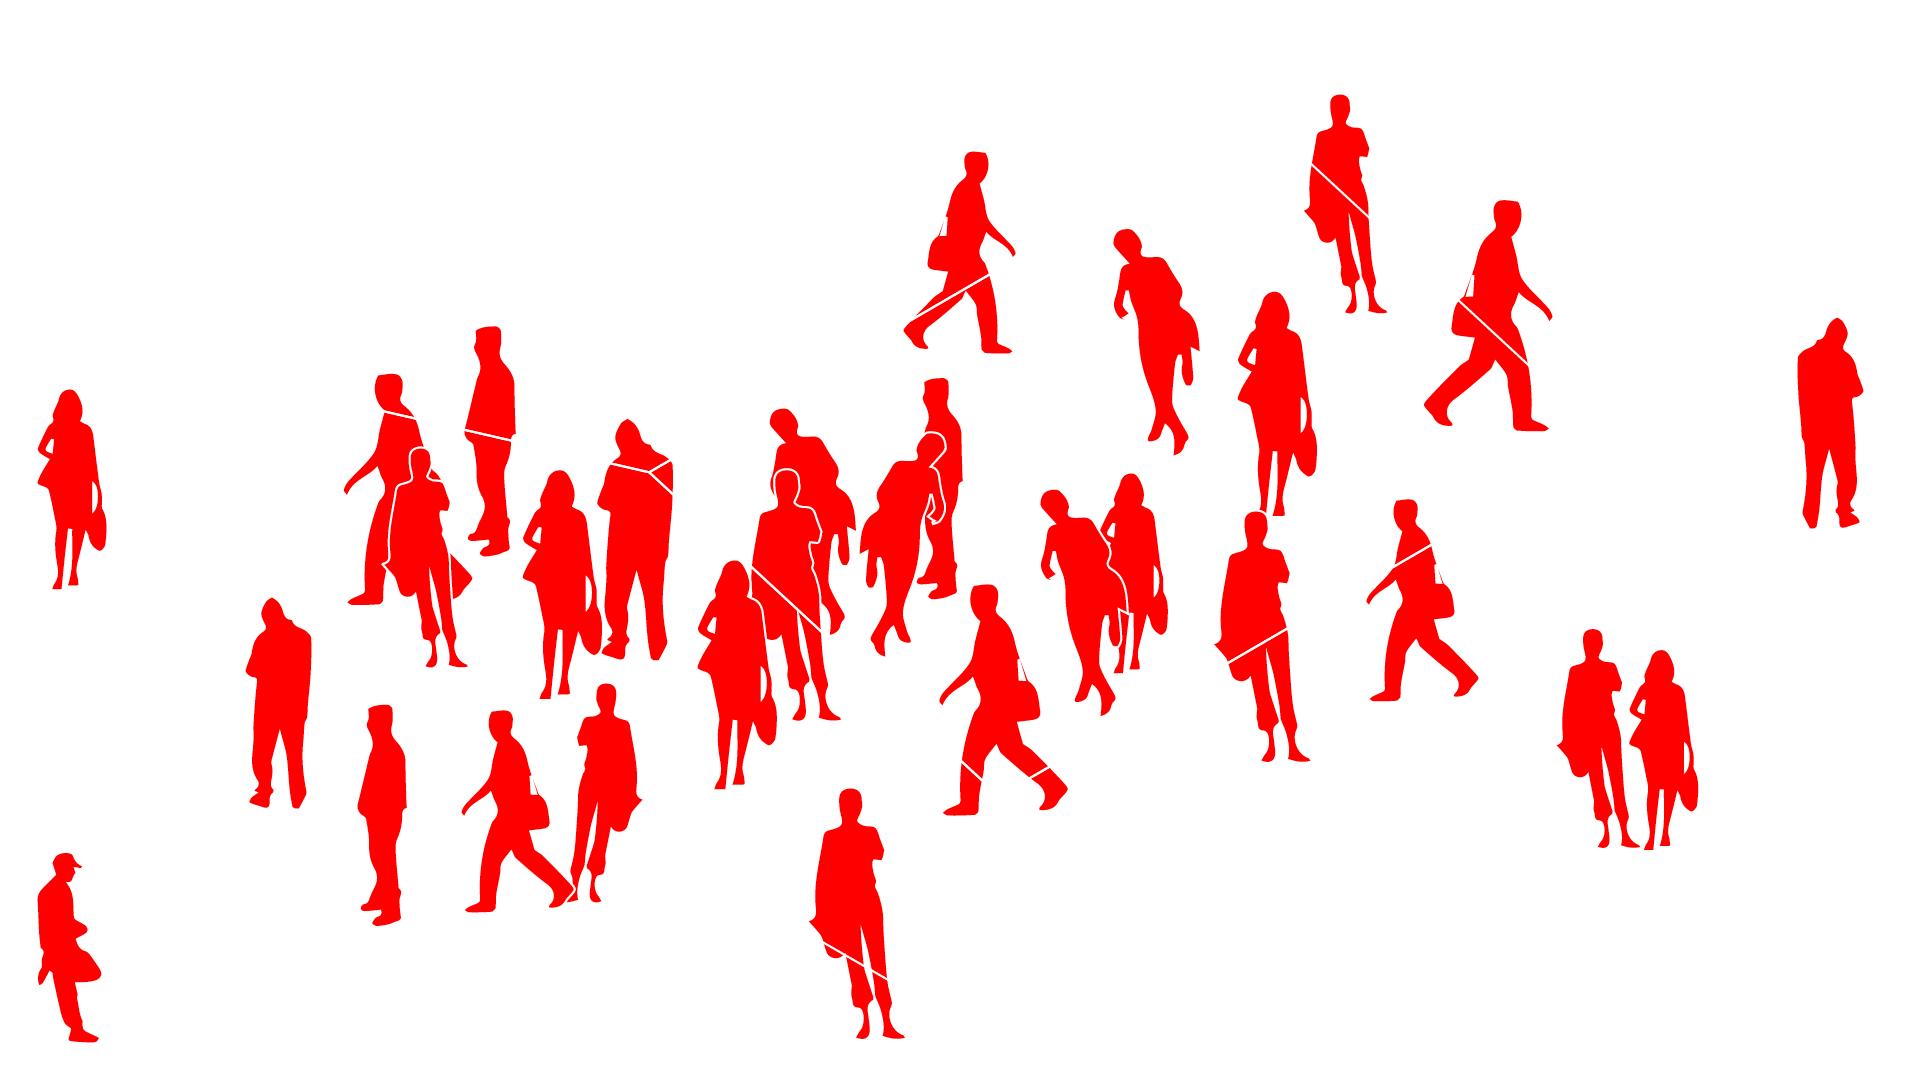 BA SCHOLARSHIP, LIBERAL ARTS, SIBERIA